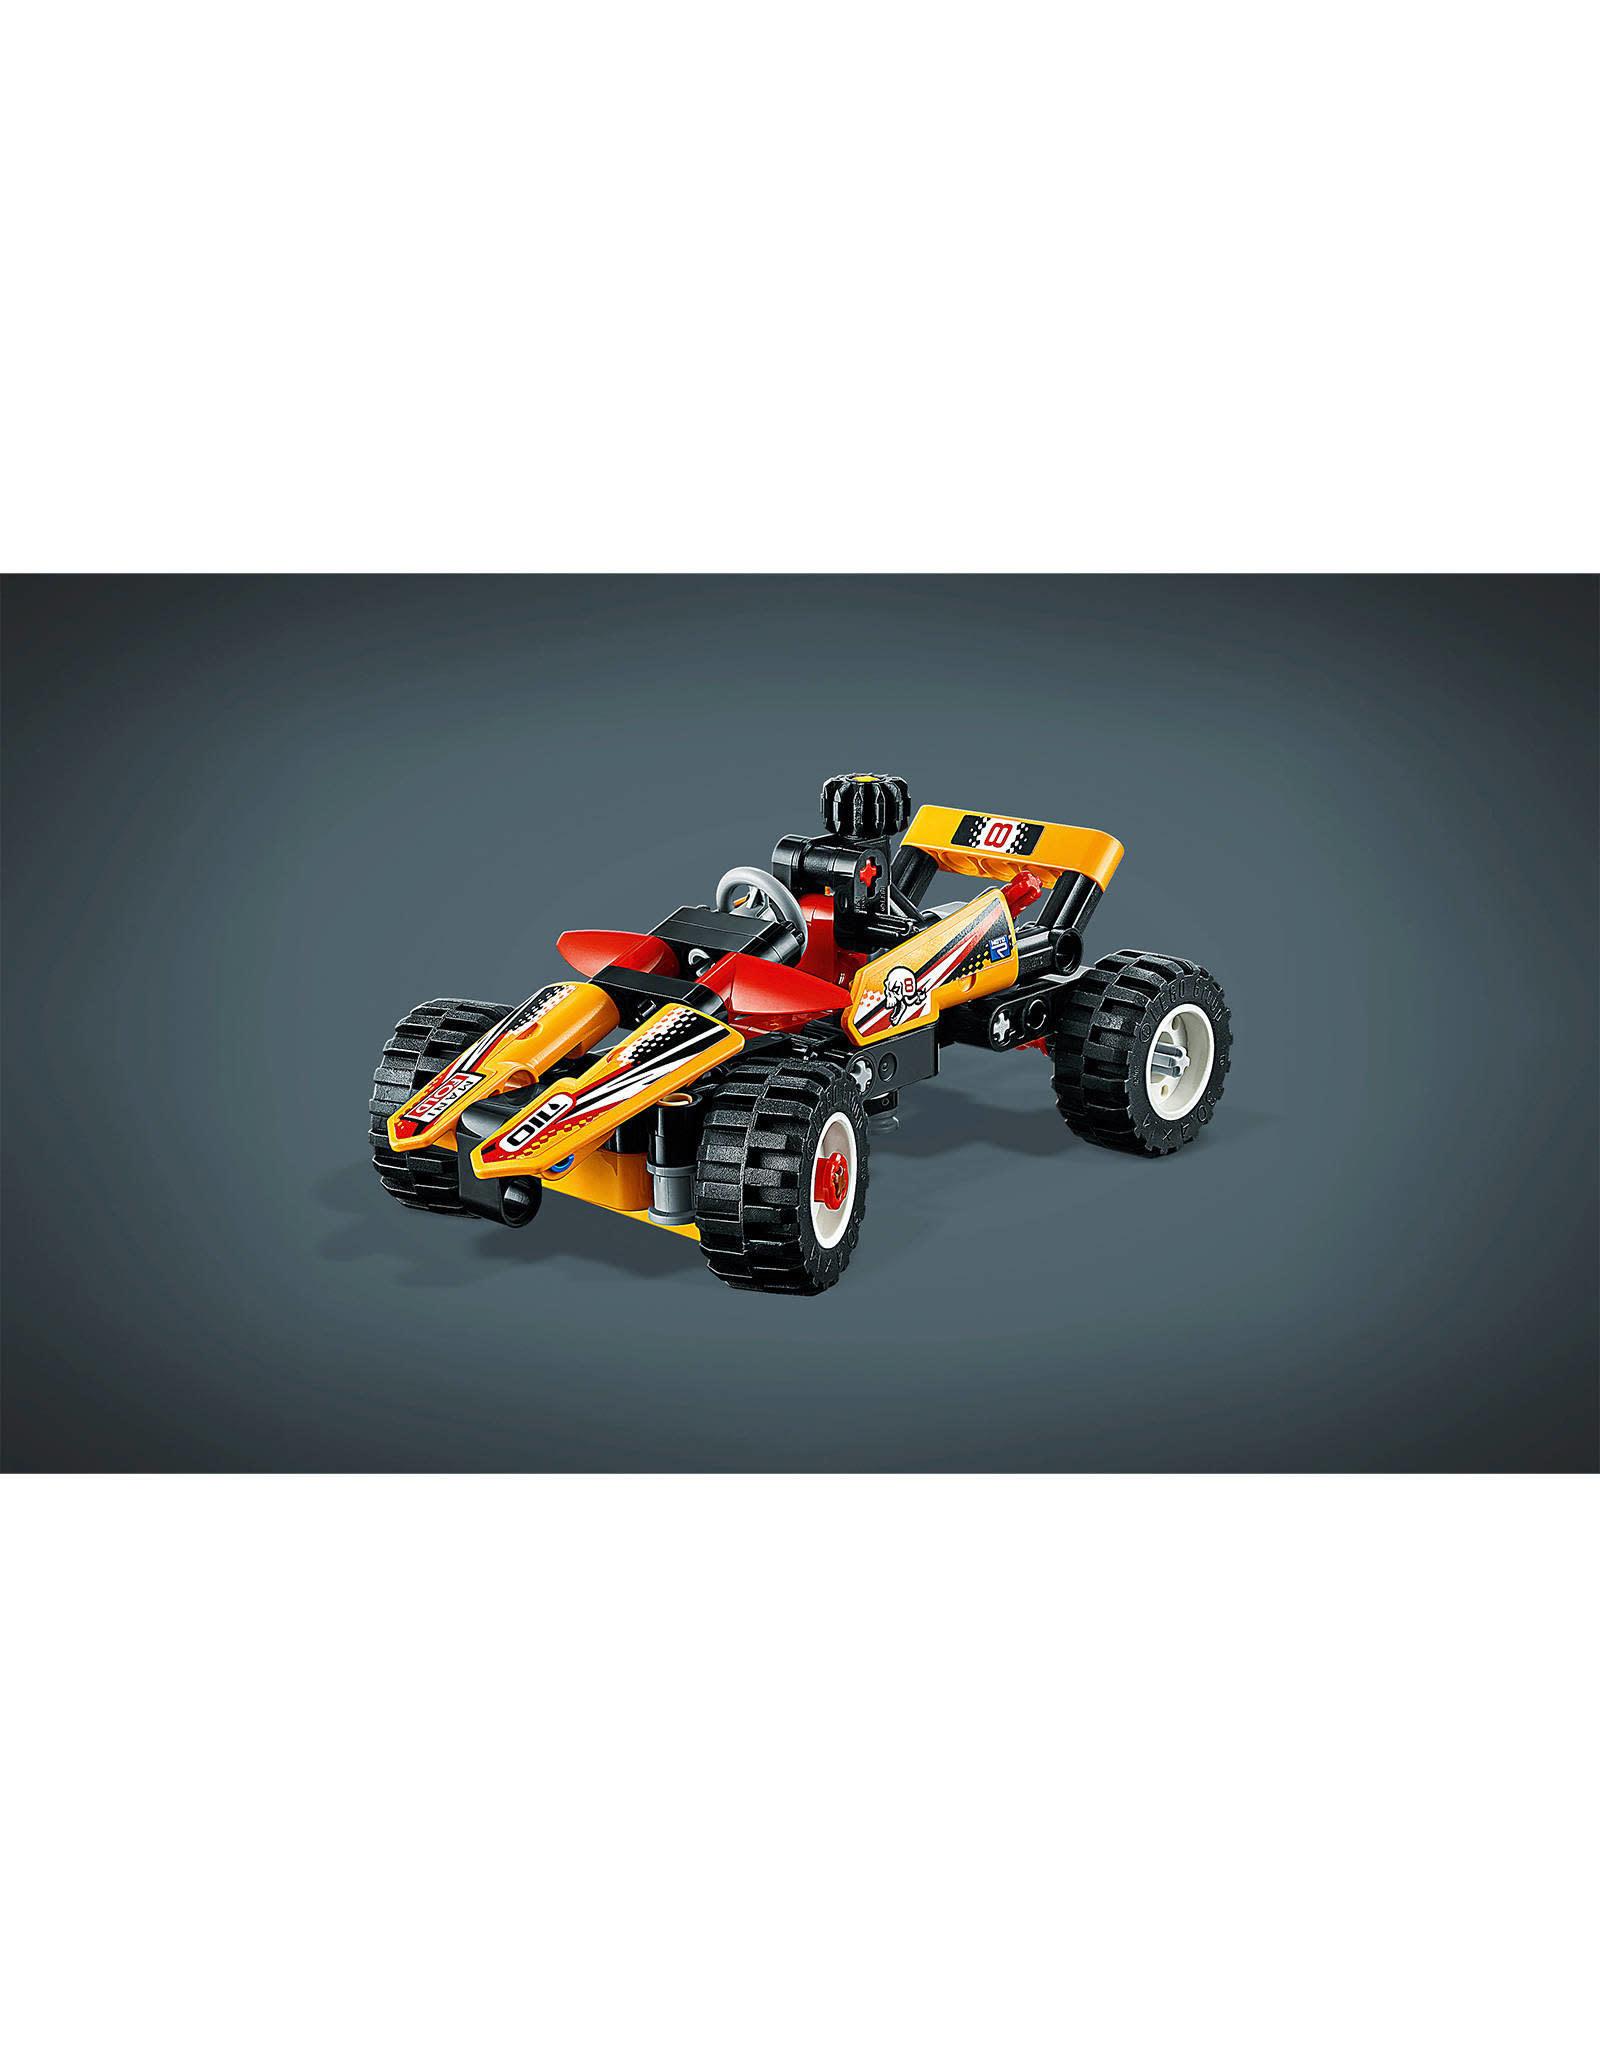 LEGO Buggy Lego 42101